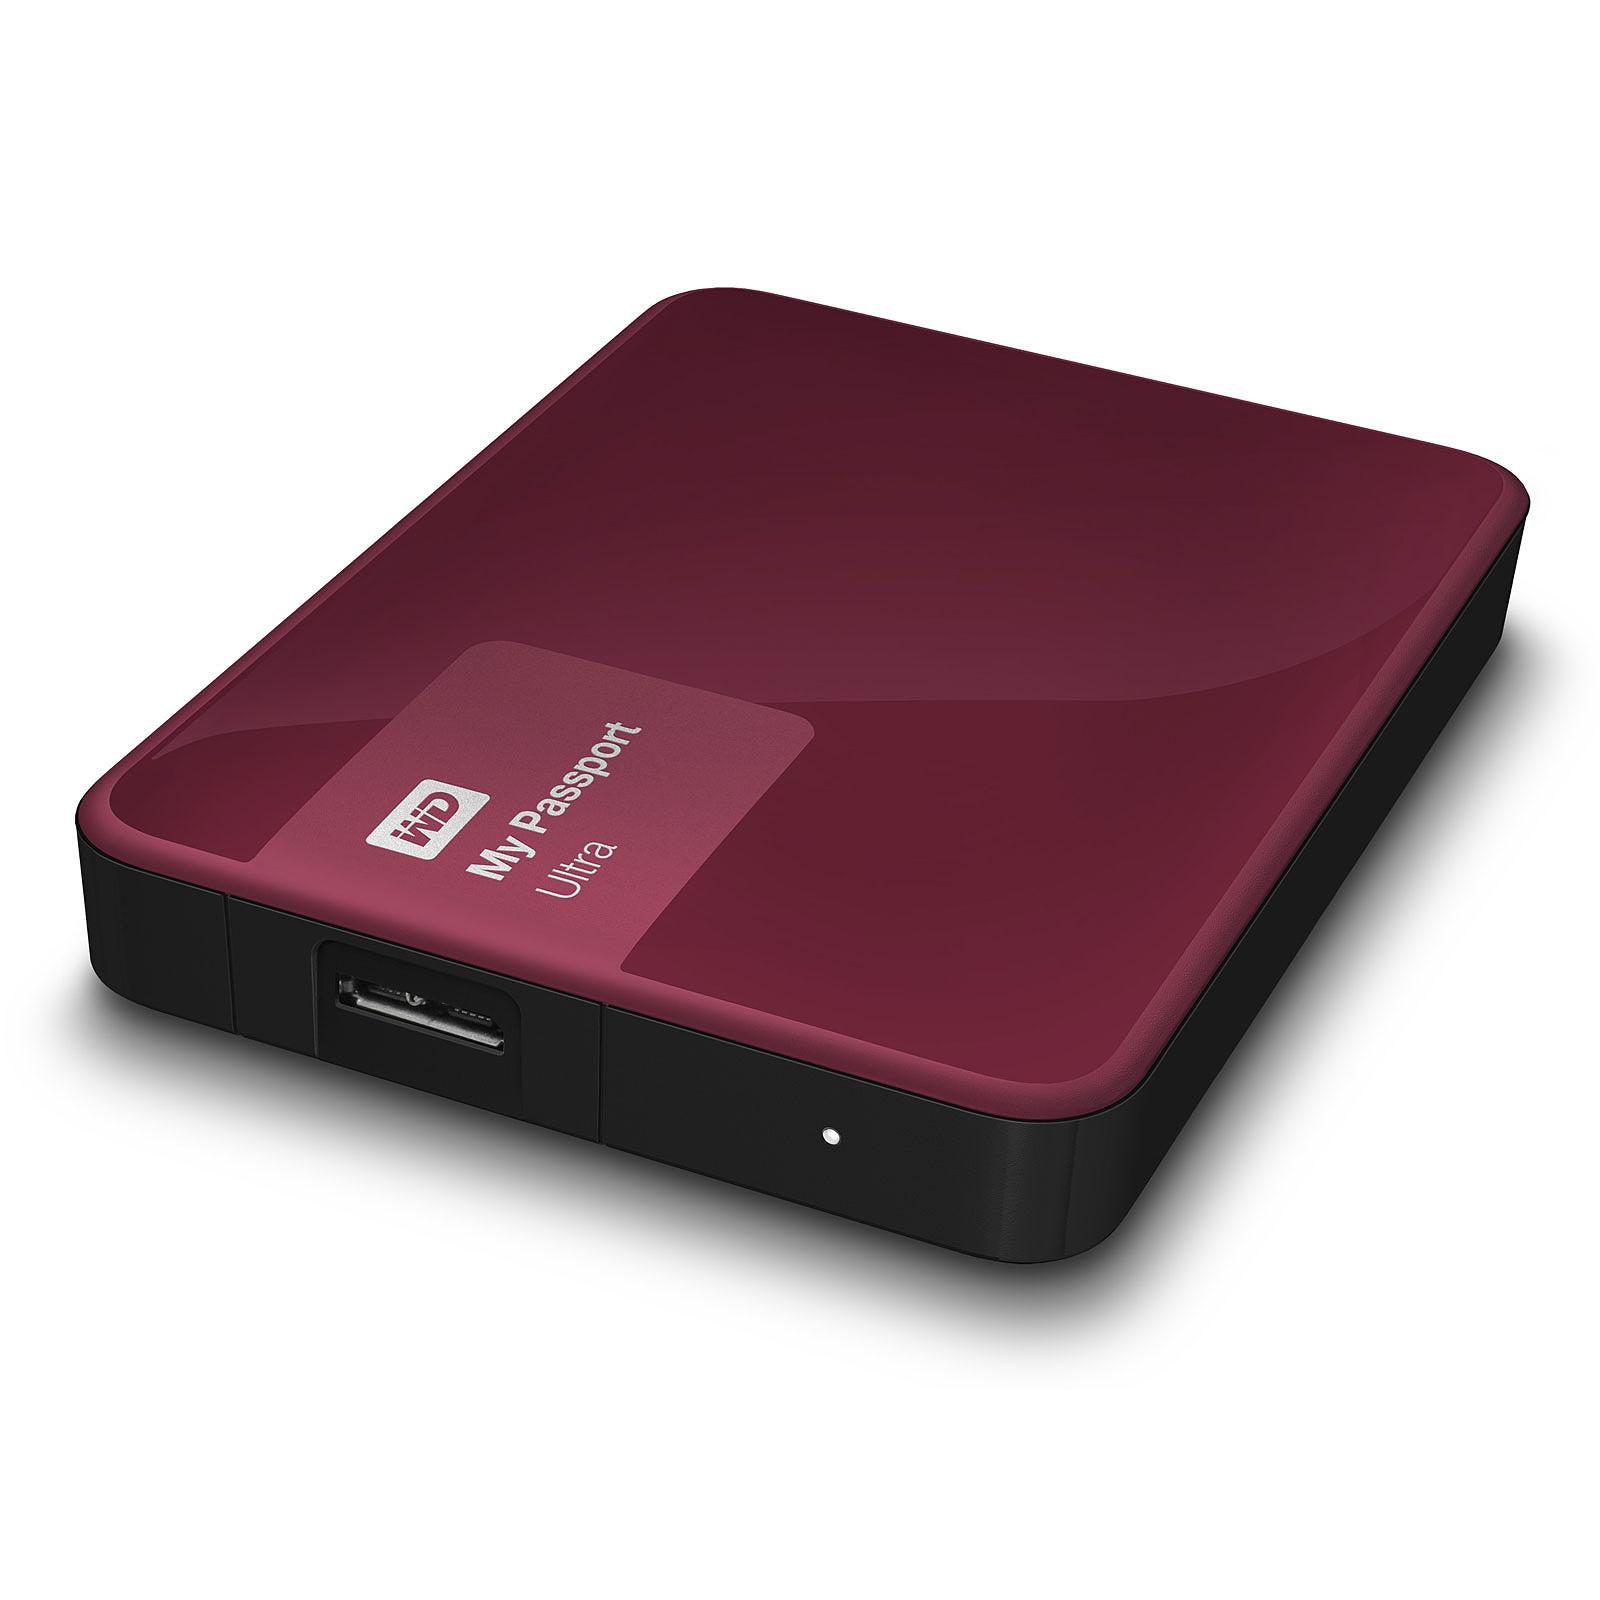 WD My Passport Ultra 2 To Berry (USB 3.0)